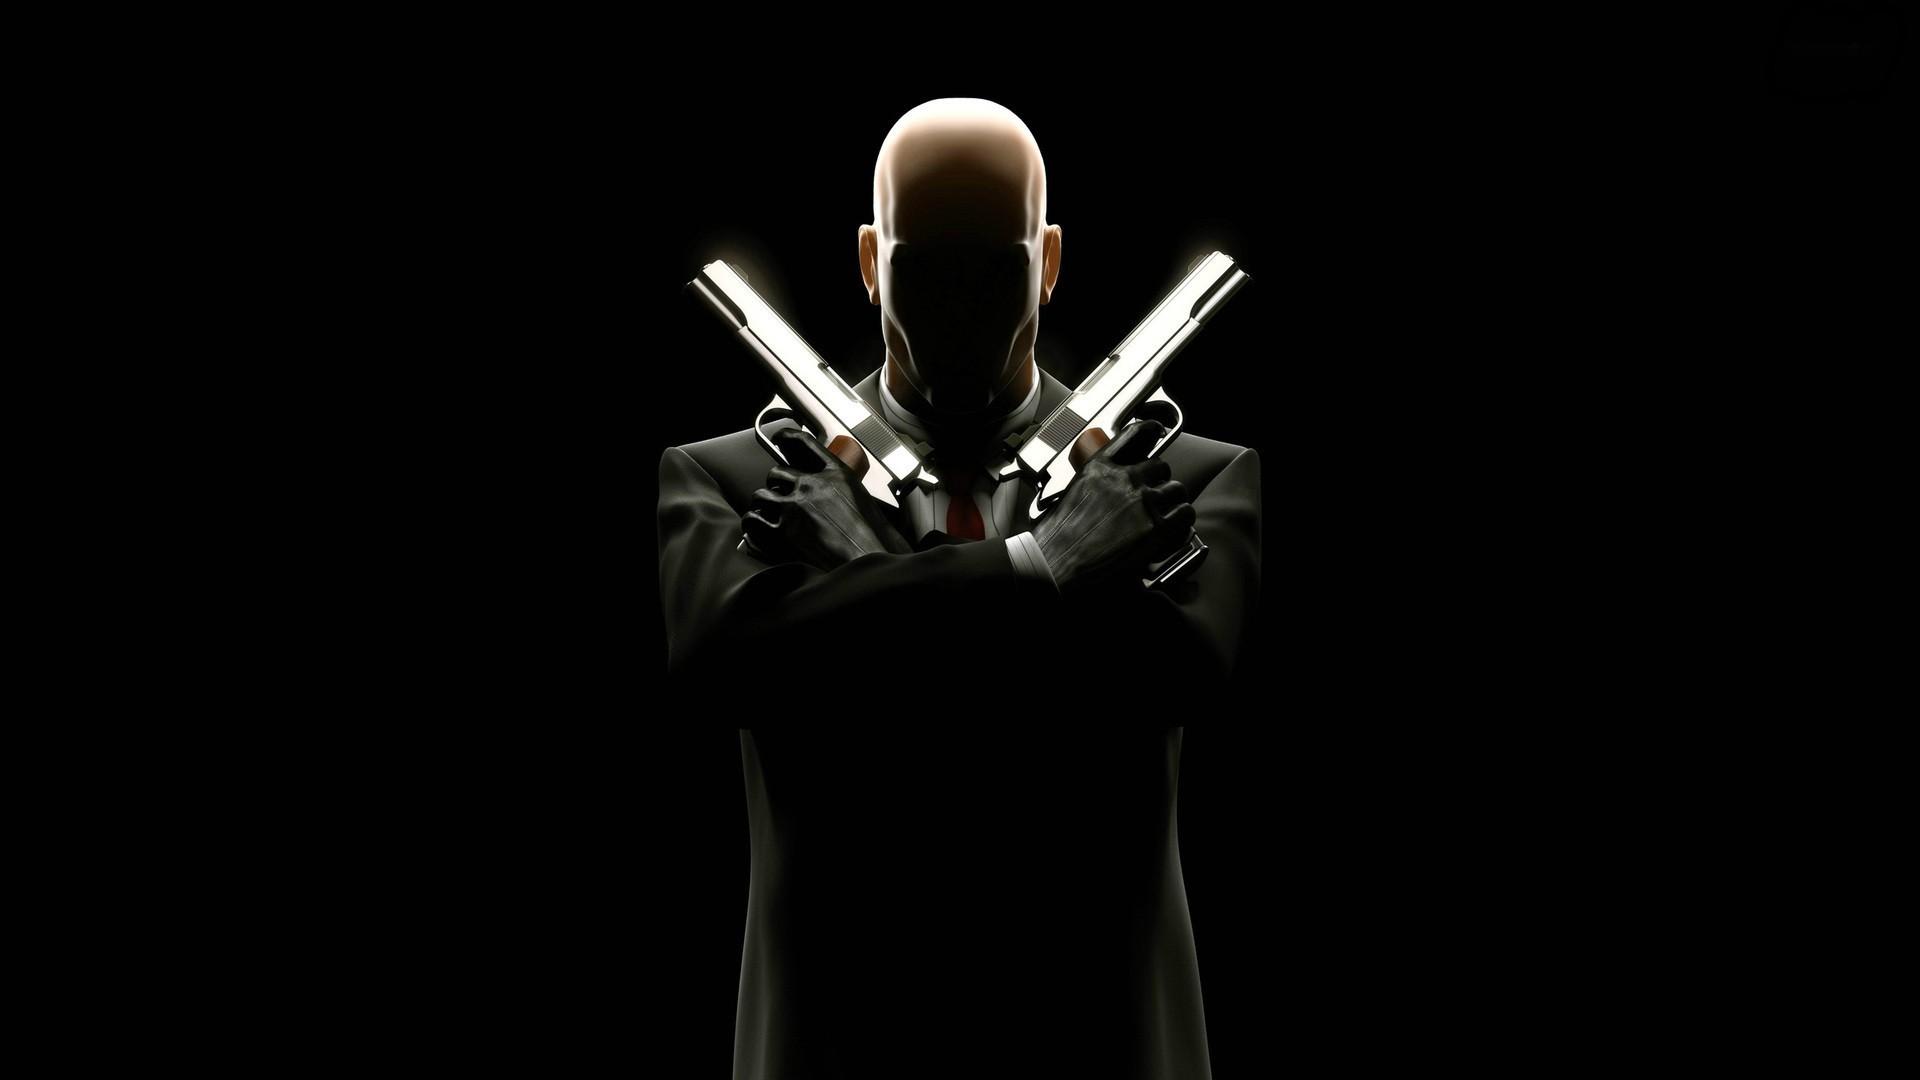 Killer – The Game of Assassination